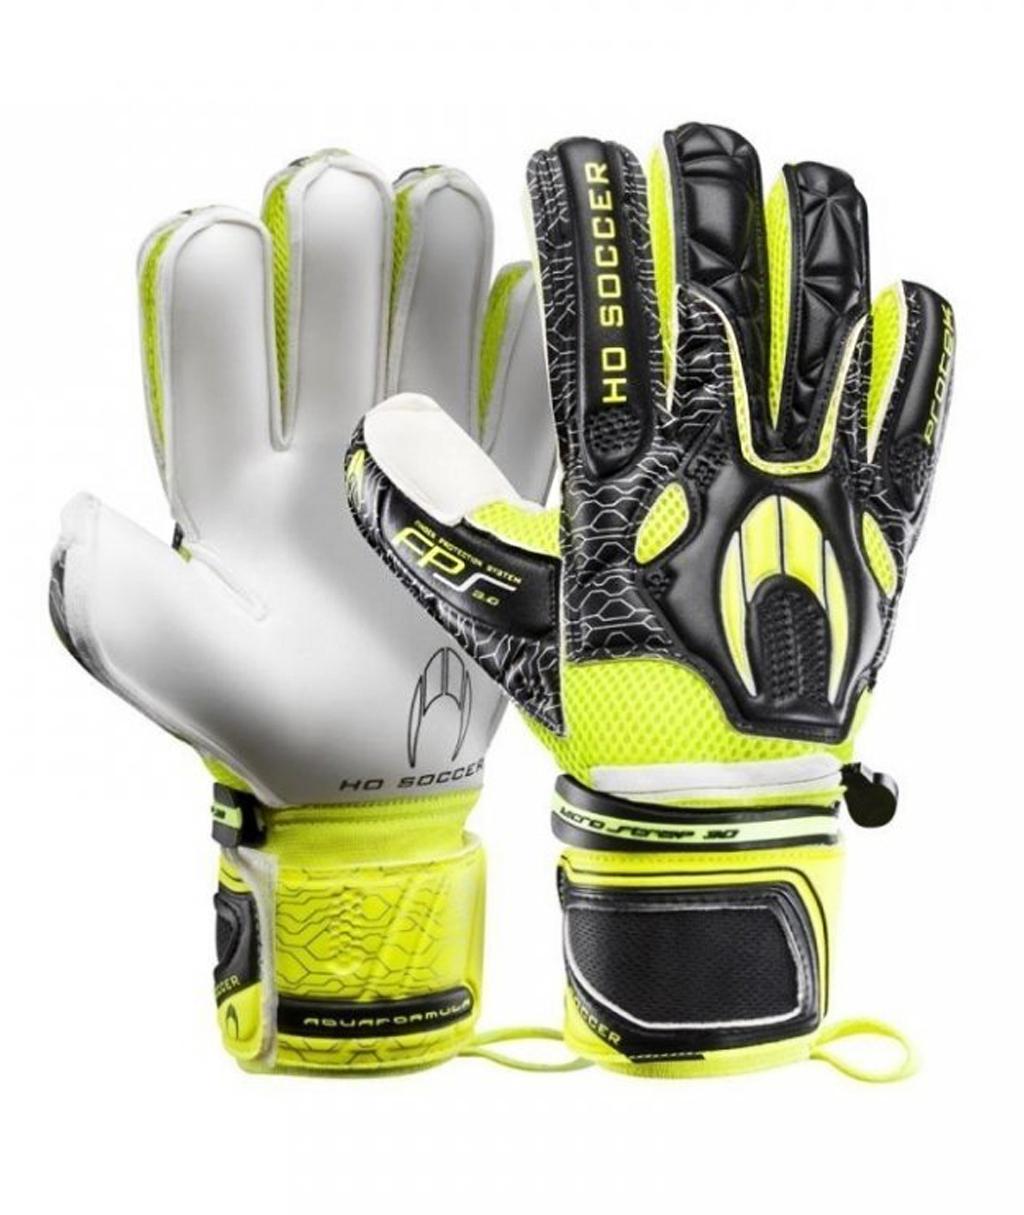 Вратарские перчатки HO Soccer Protek Tek Flat Gen 2 051.0635